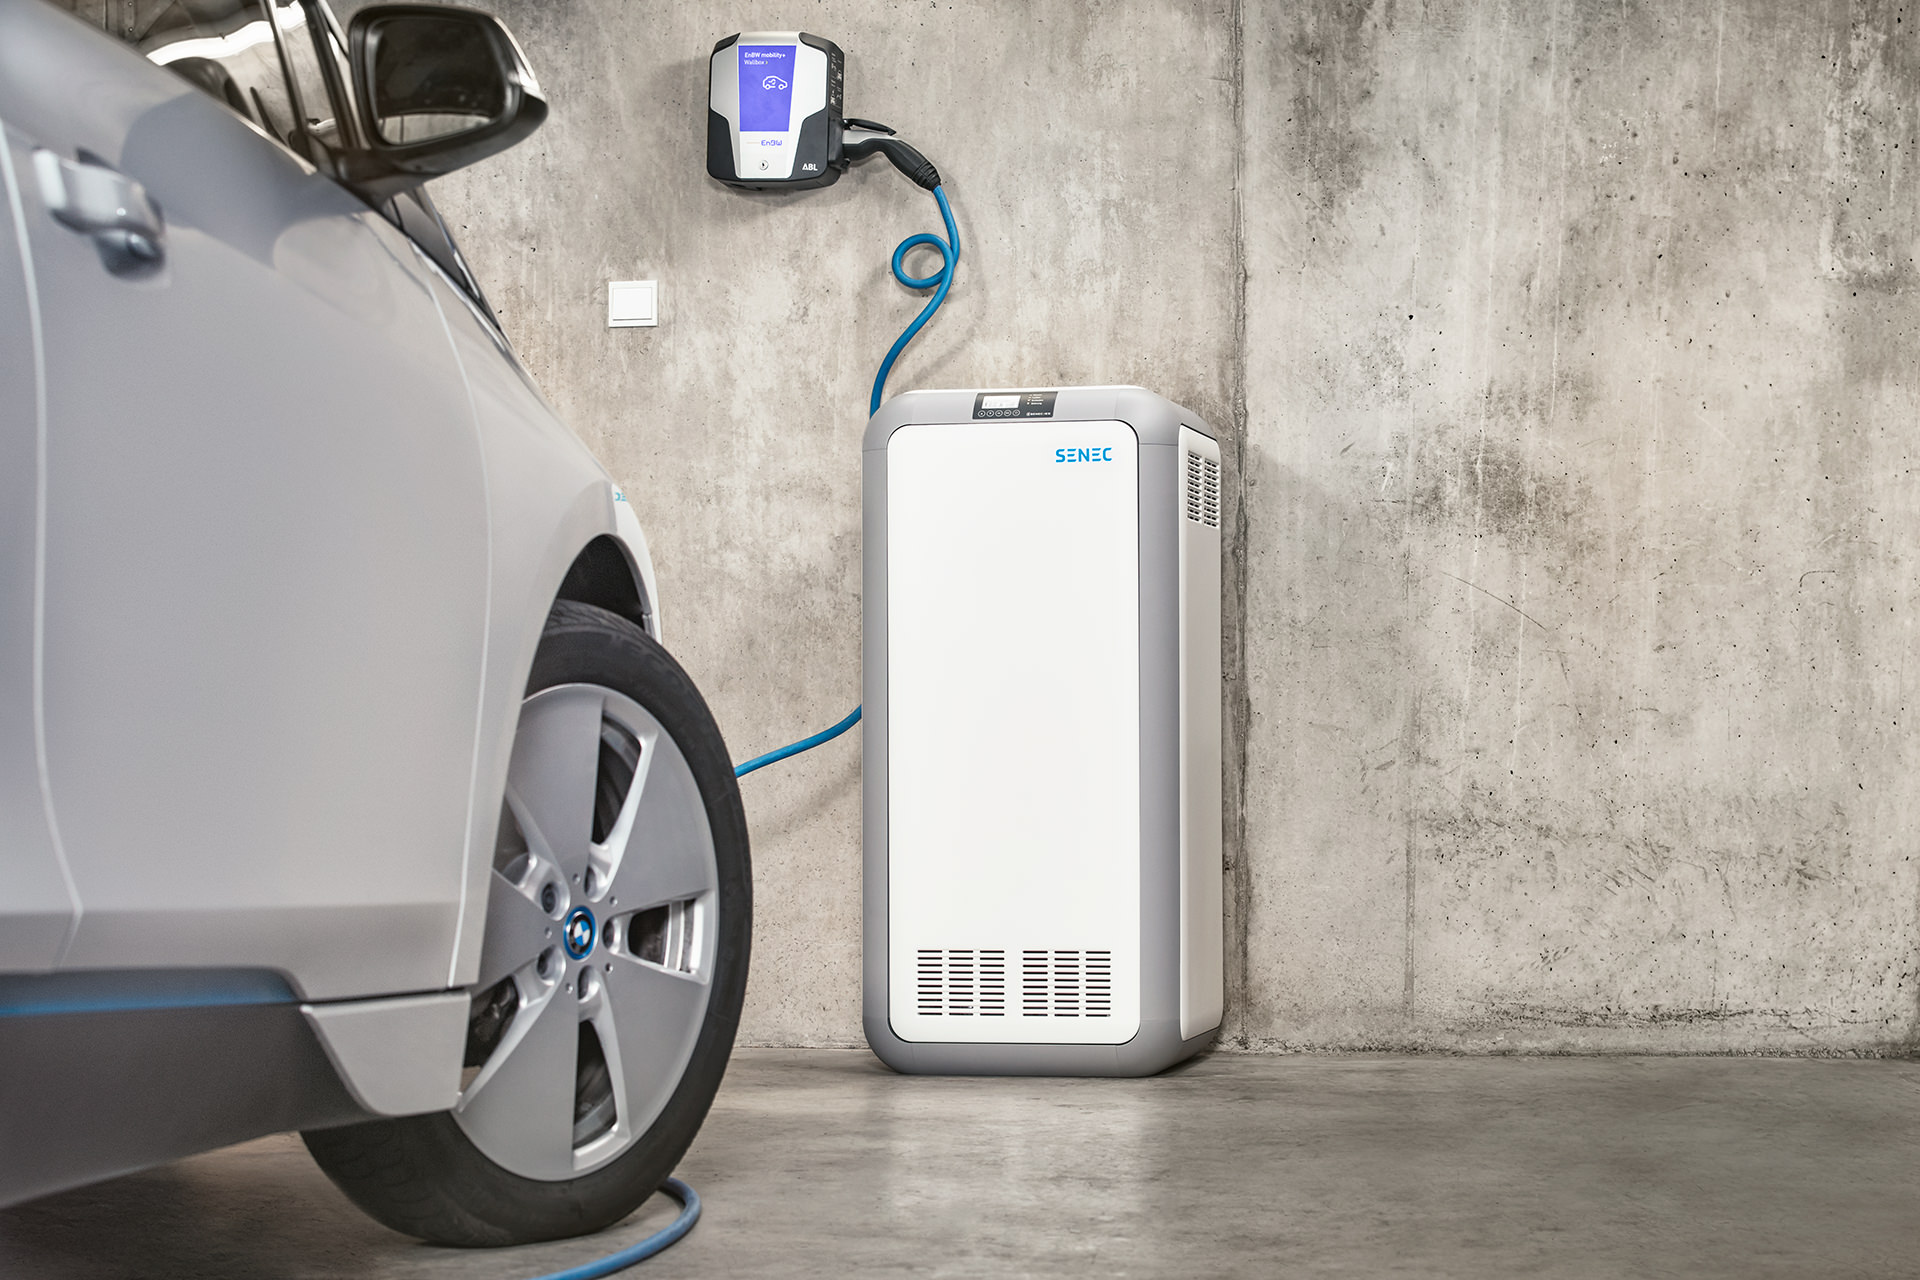 energie-speicher-laden-senec-kampagne